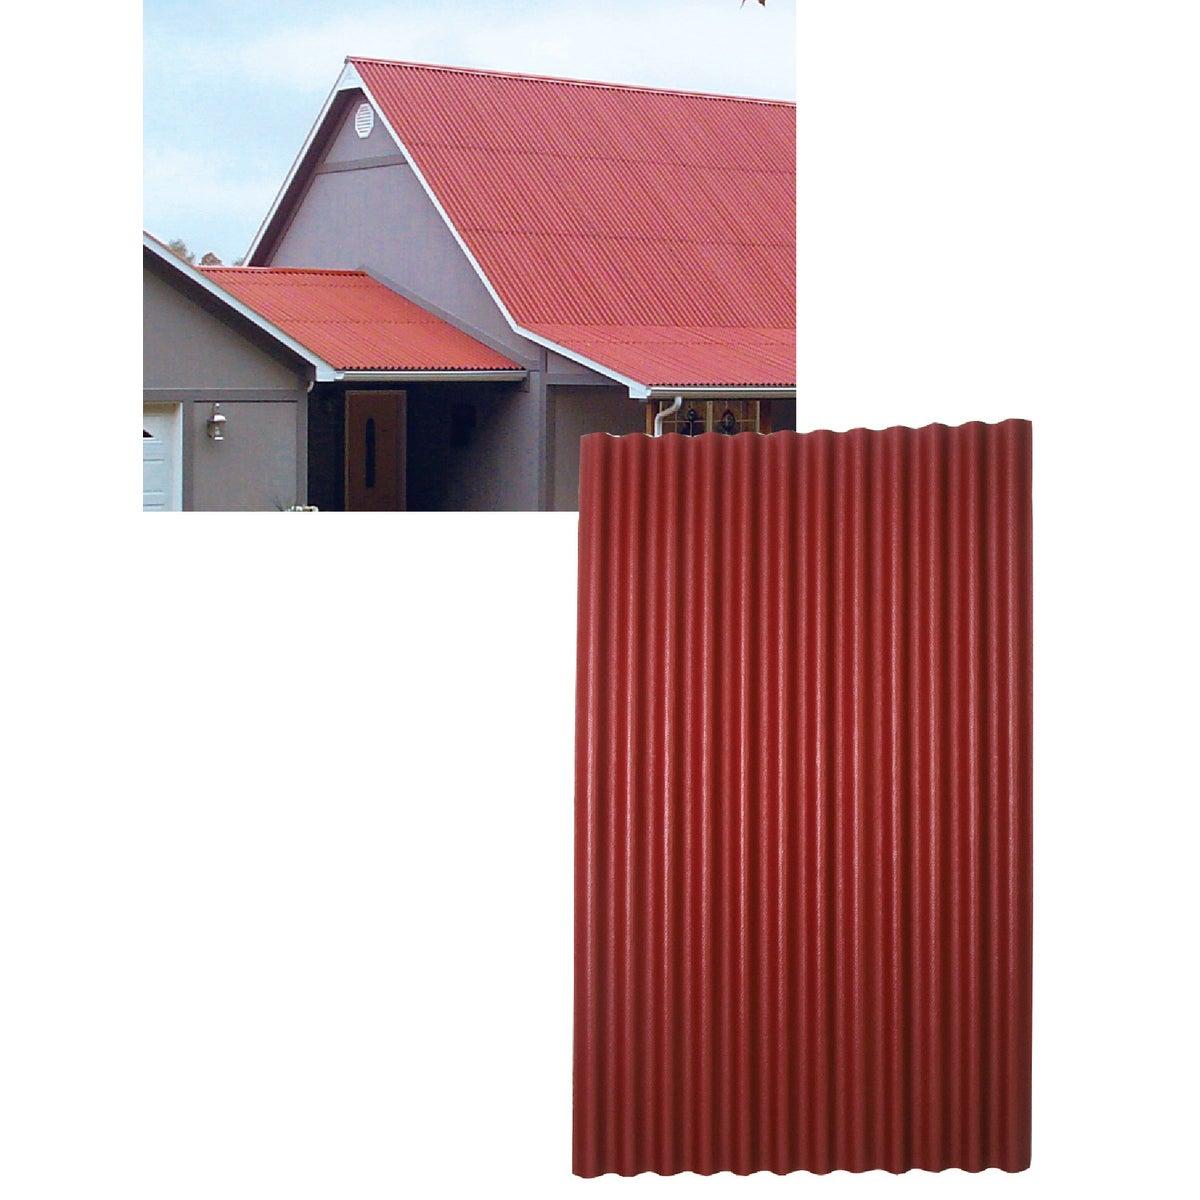 48X79 RED ONDURA ROOFING